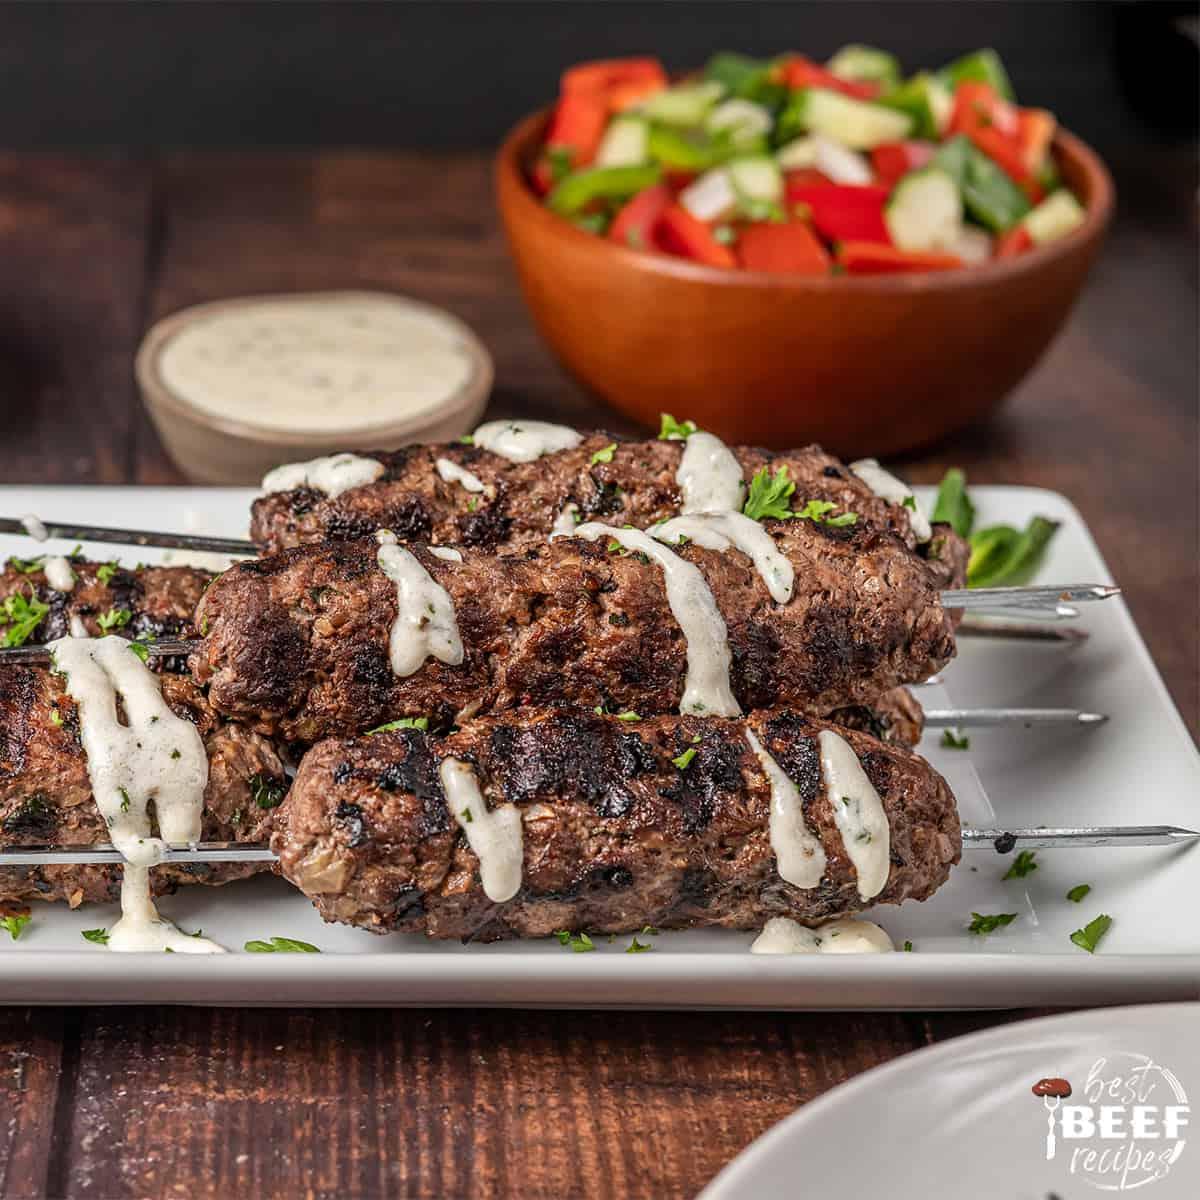 Kofta kebabs on a white platter with garlic sauce